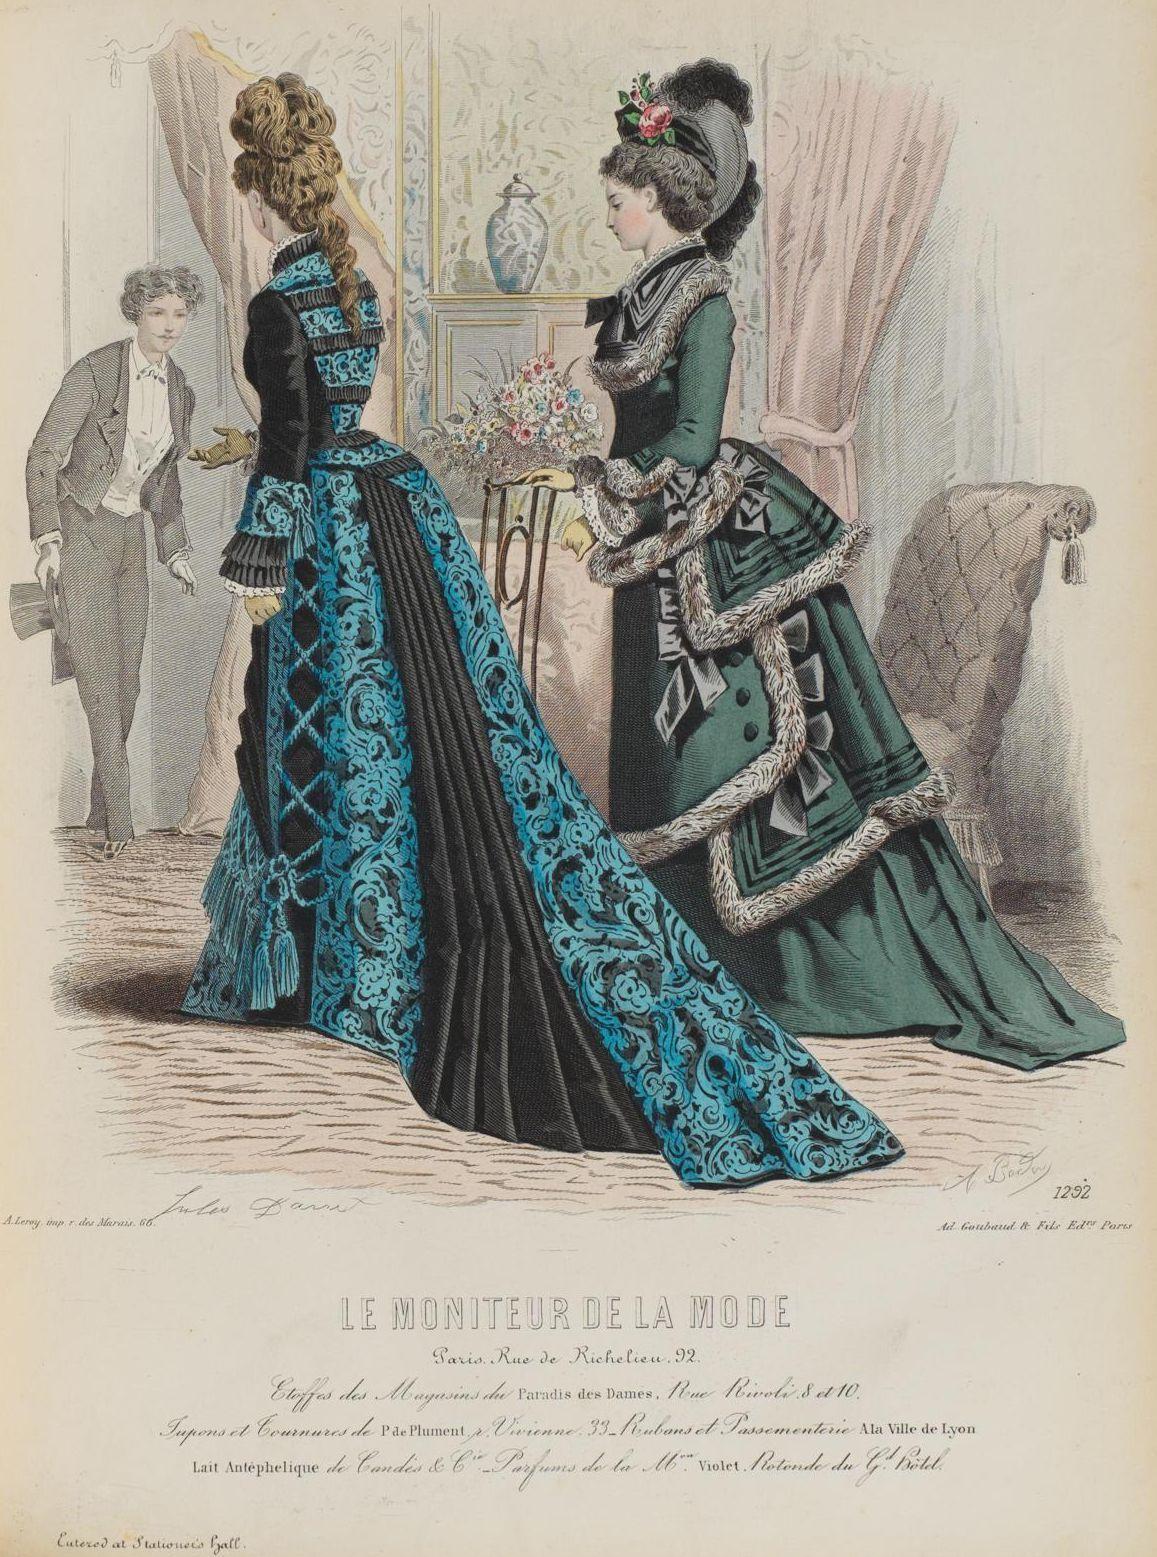 Le Moniteur de la Mode 1876 | 1869-1877 early bustle fashion plates ...